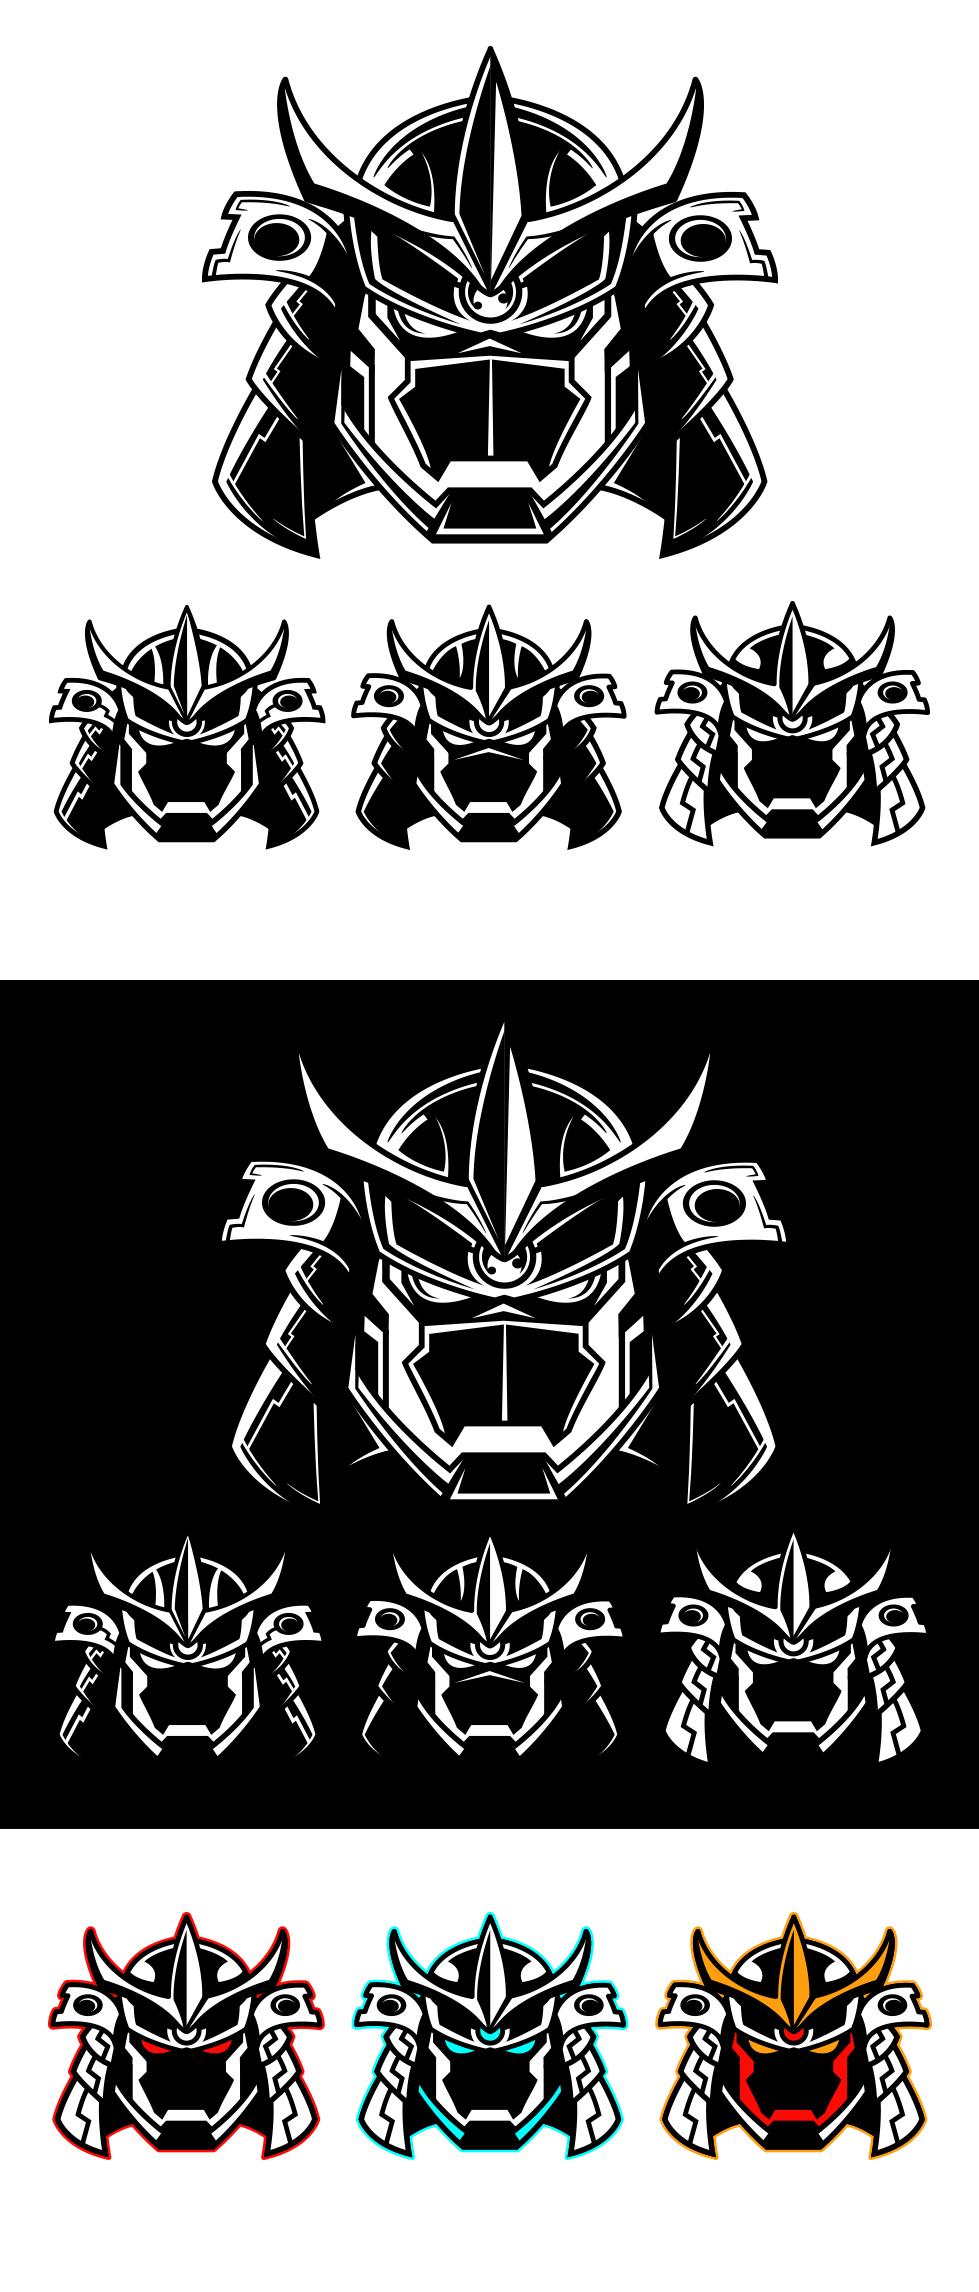 MECHA-MILITARY-ROBOTO SAMURAI HELMET & MASK logo